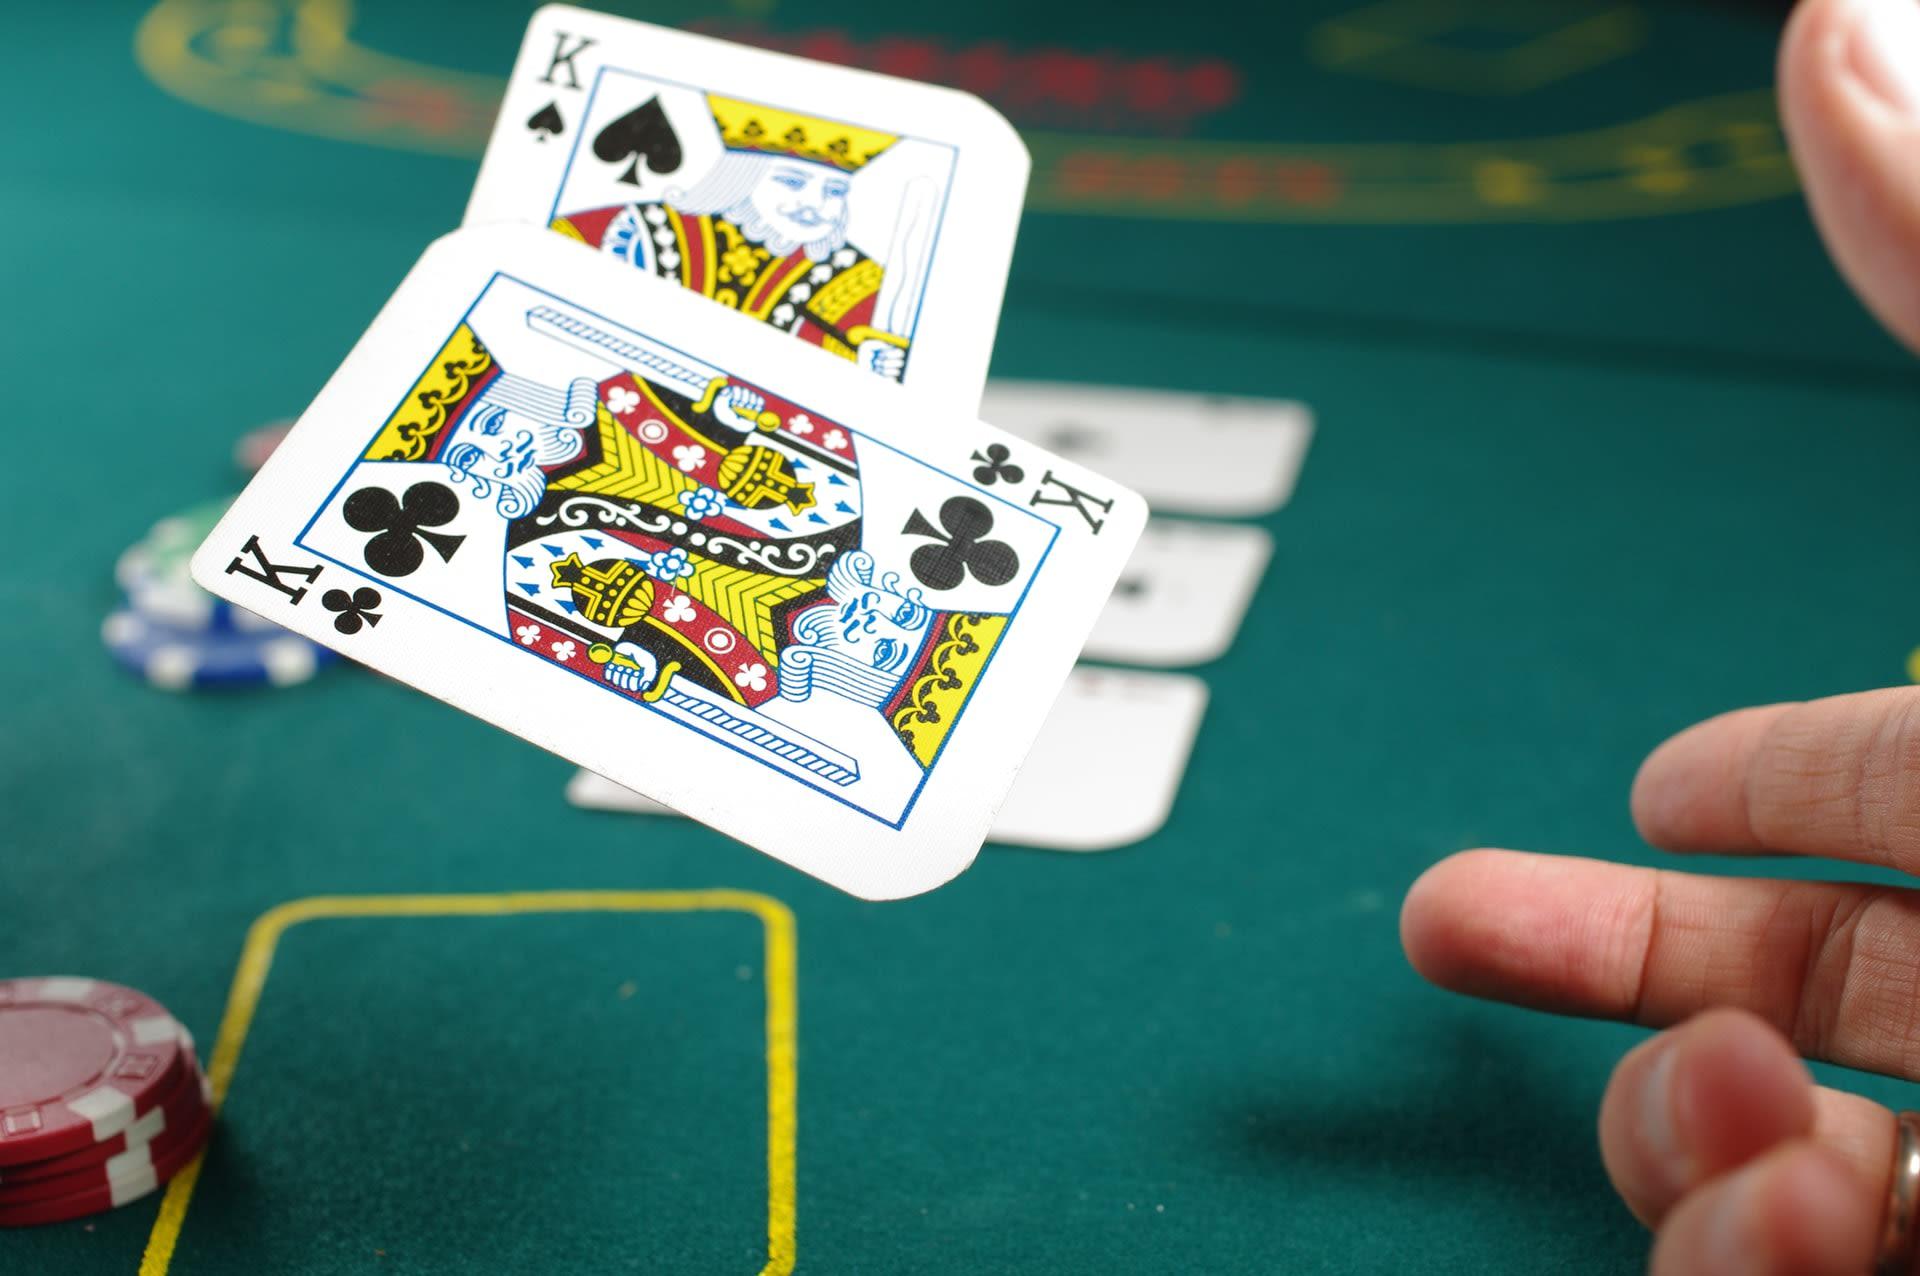 Petua mencuba dan benar untuk menang di Blackjack